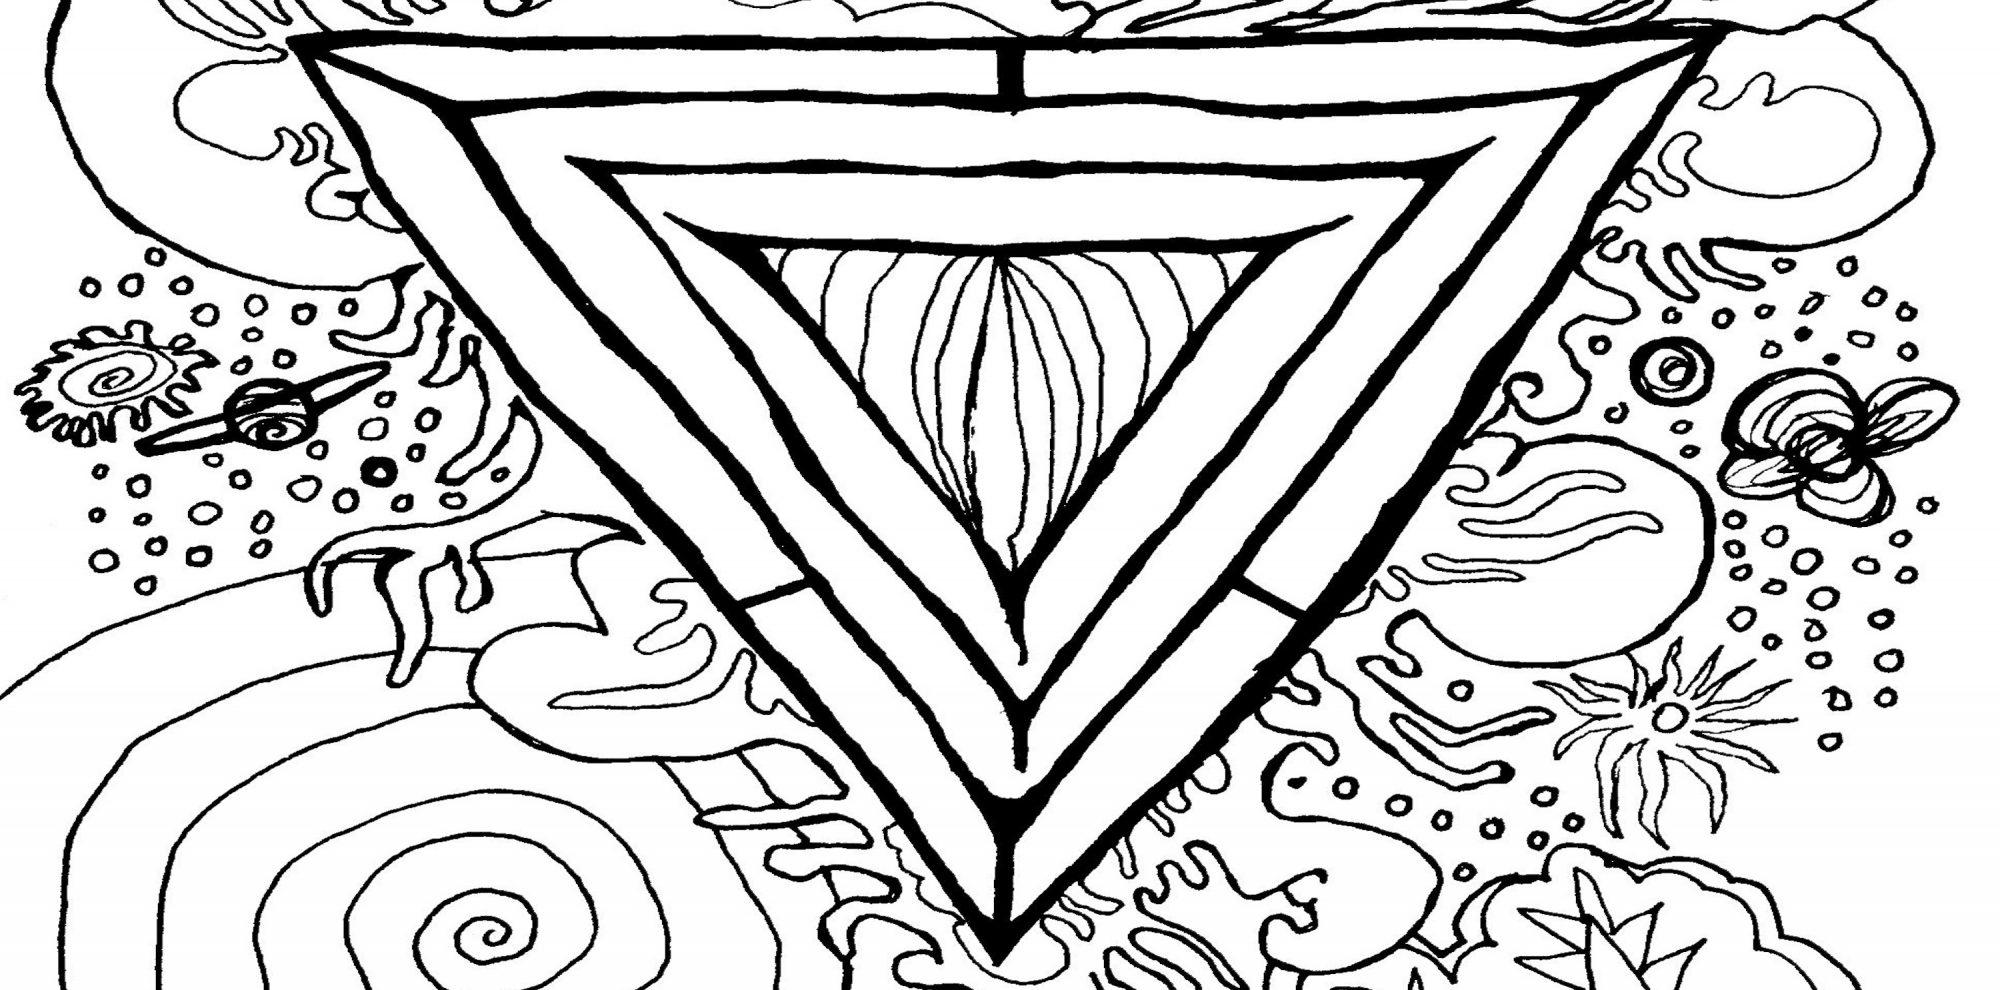 Sheer Zed • Electronic Musician • Artist • Shaman •